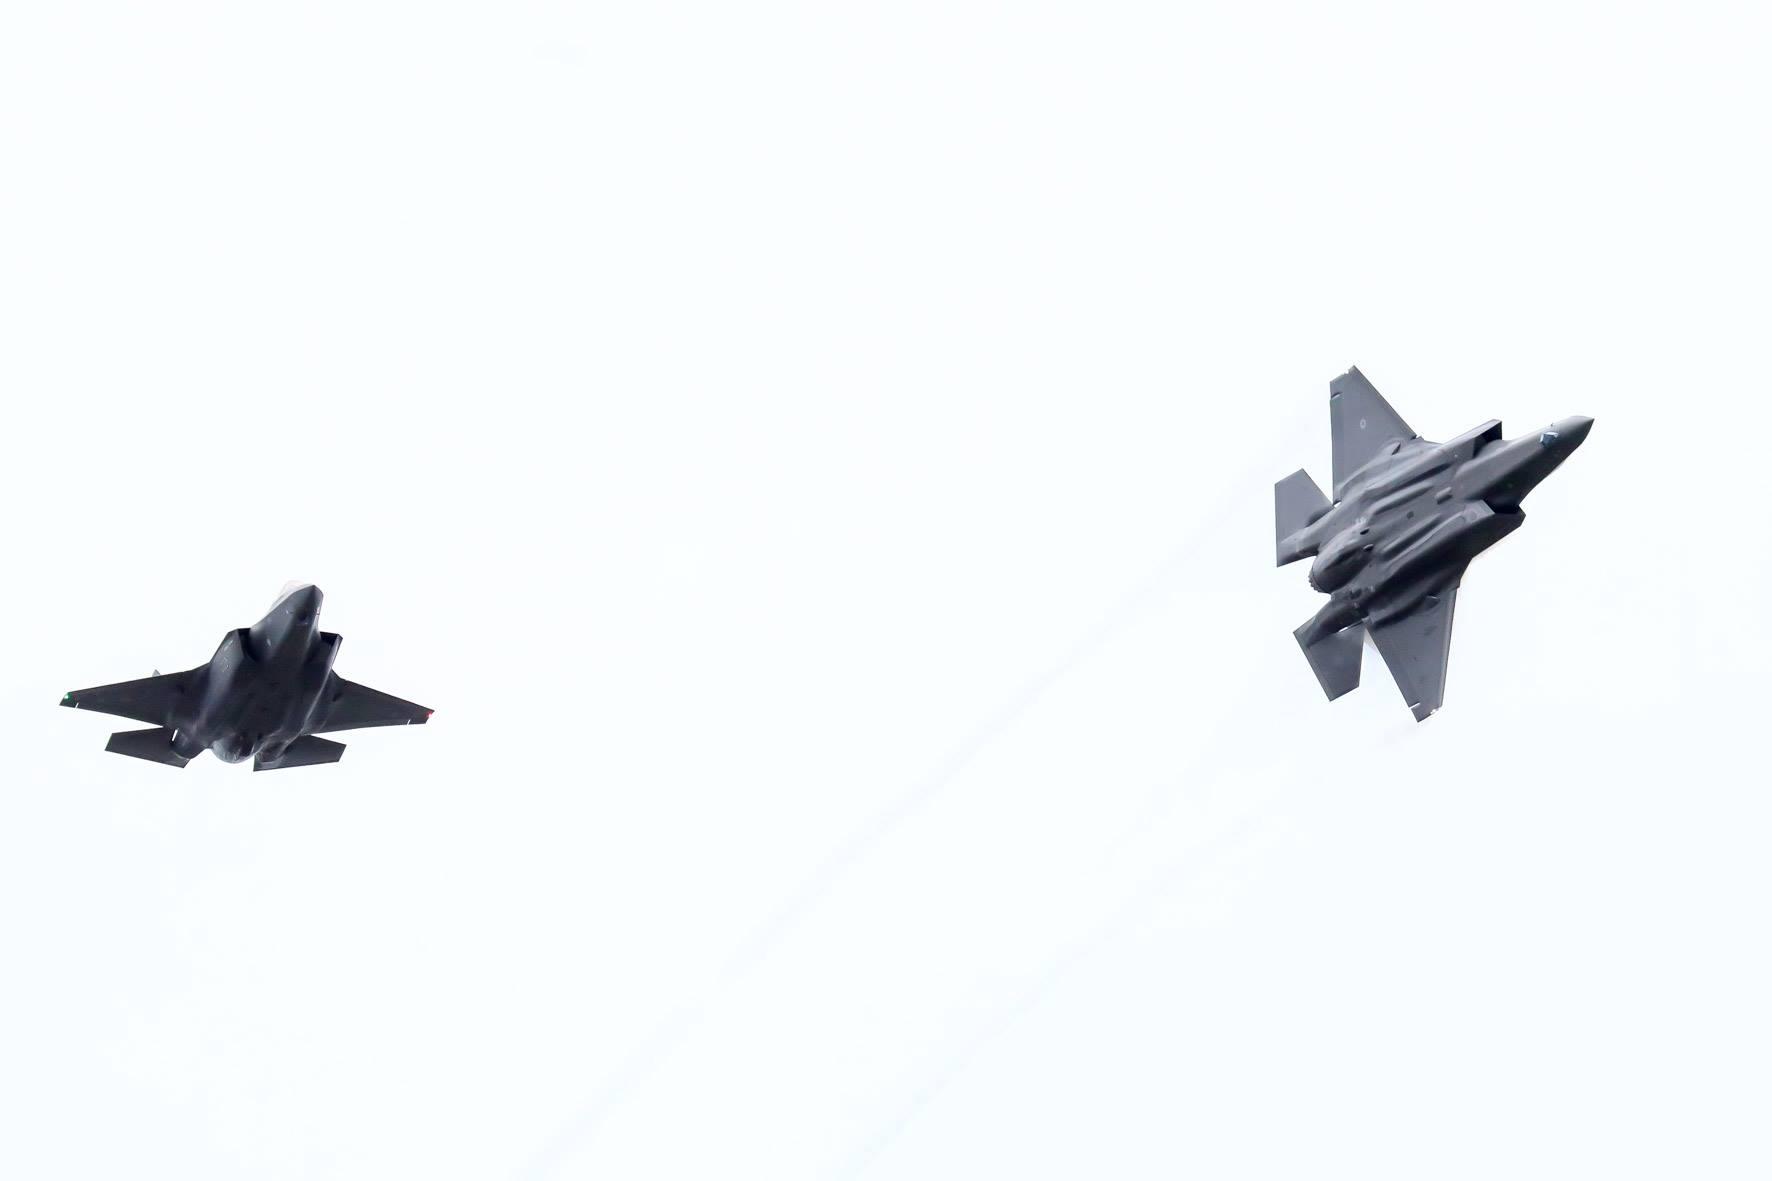 Italian Aif Force F-35 reg, 32-12 and 32-02 // Source: Hörður Geirsson